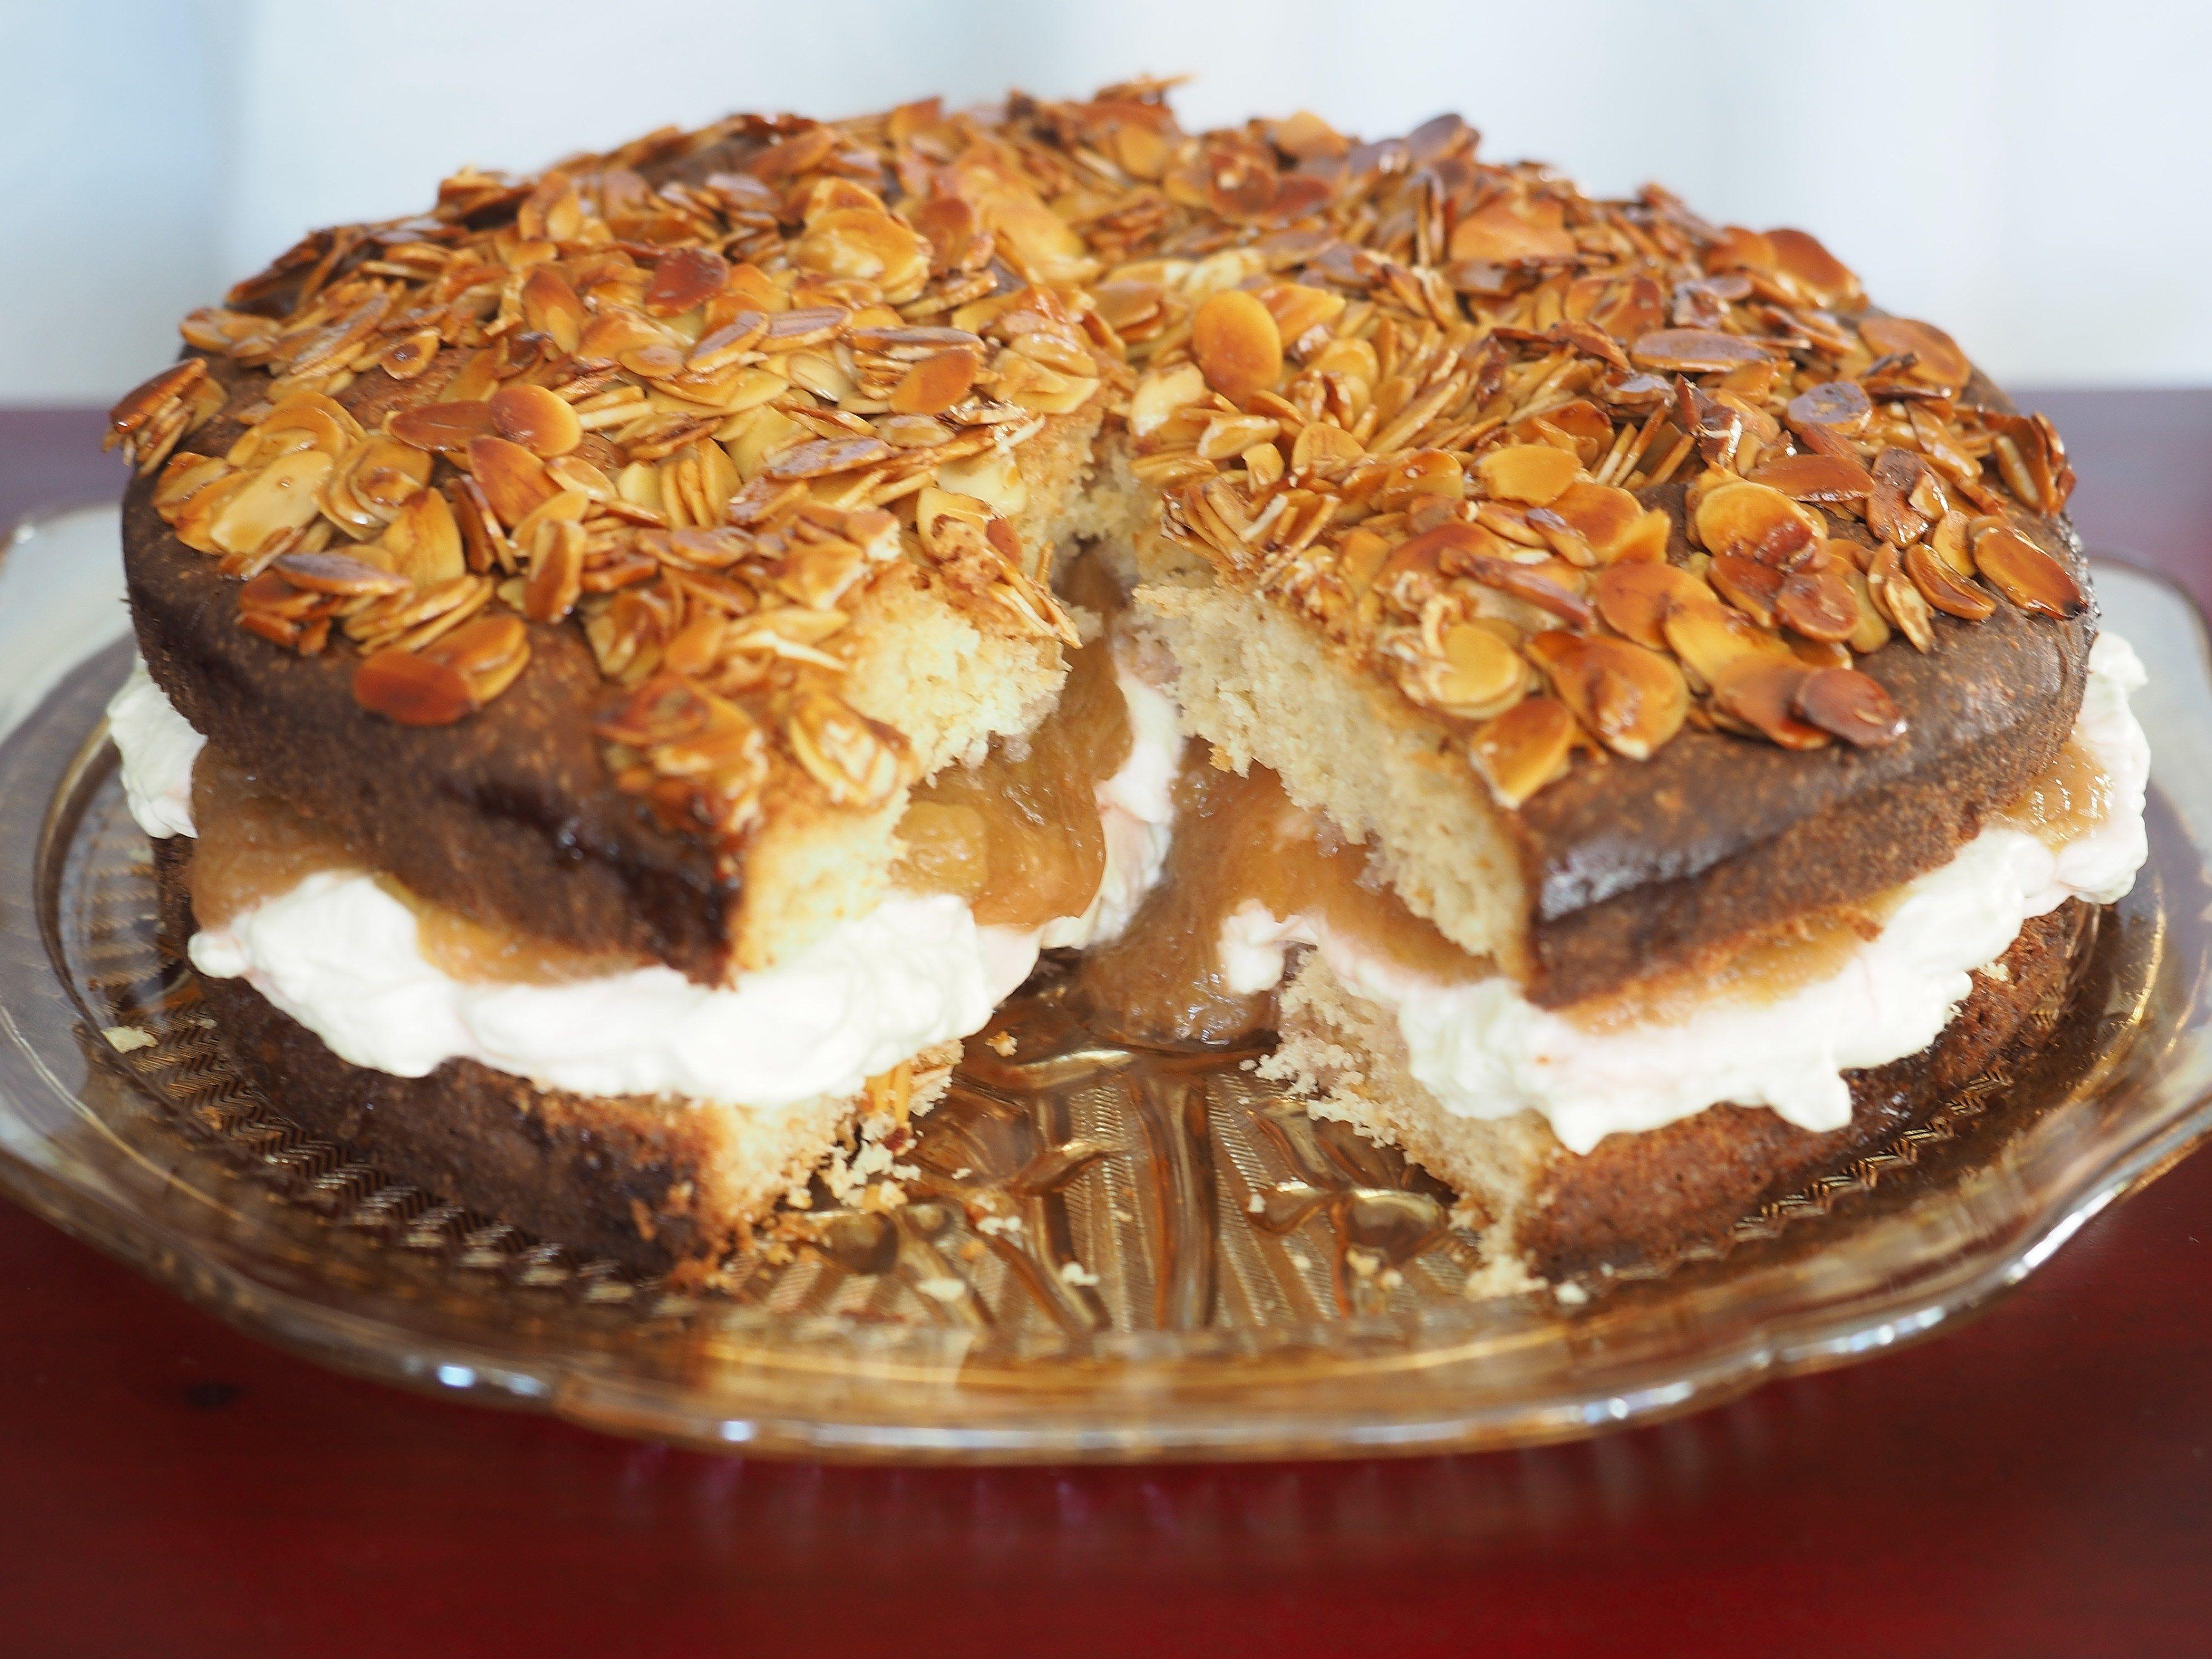 Rhubarb Bienenstich Bee Sting Cake